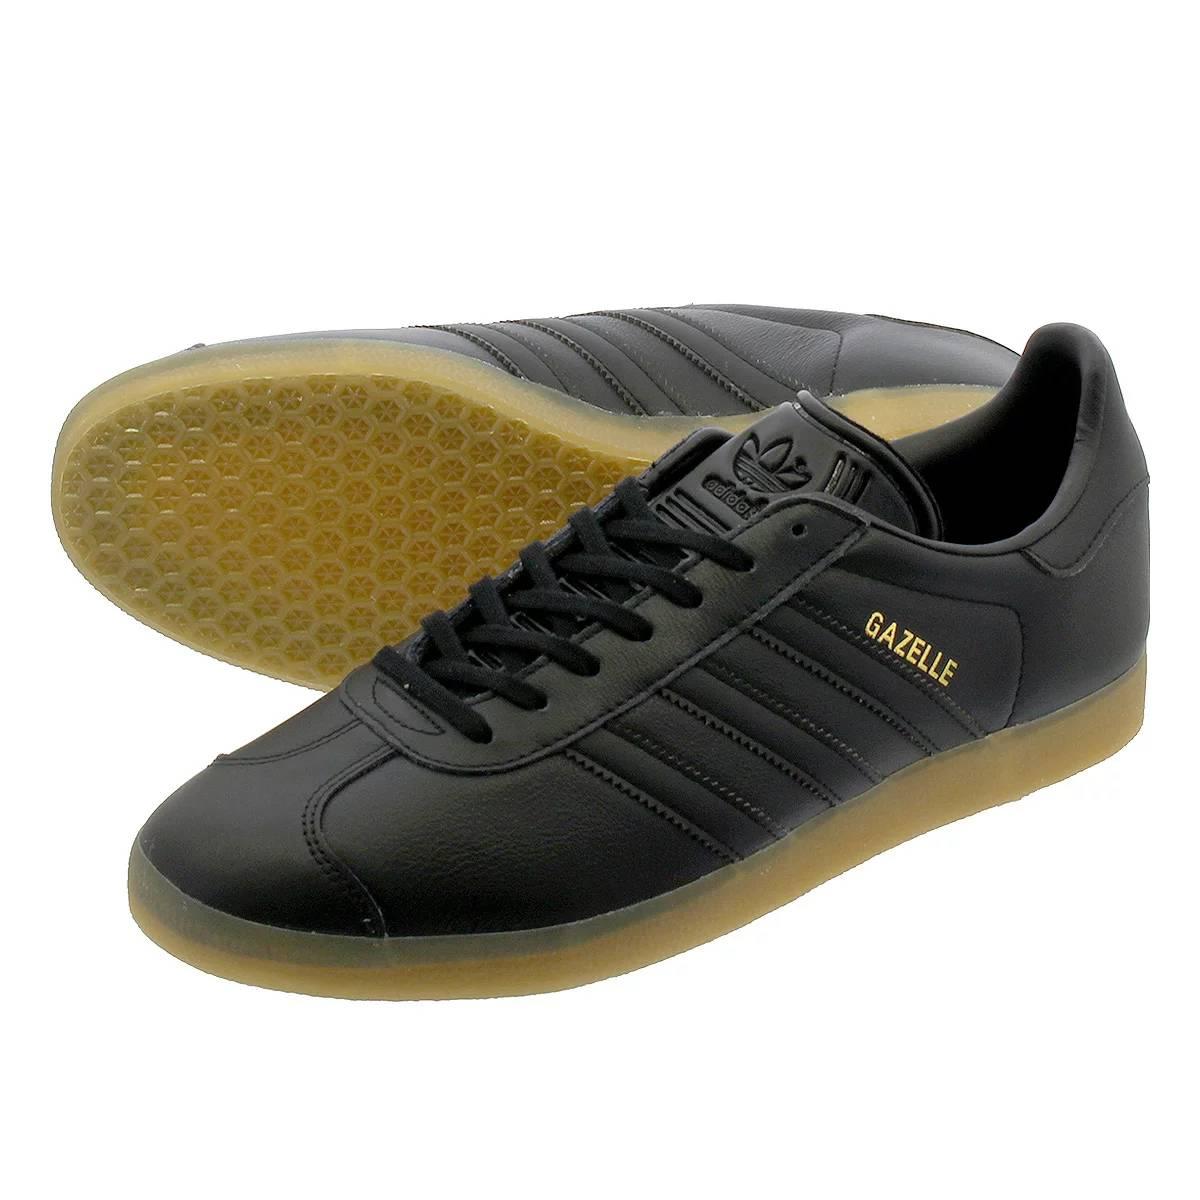 Gazelle OG Shoes Olive CargoGum